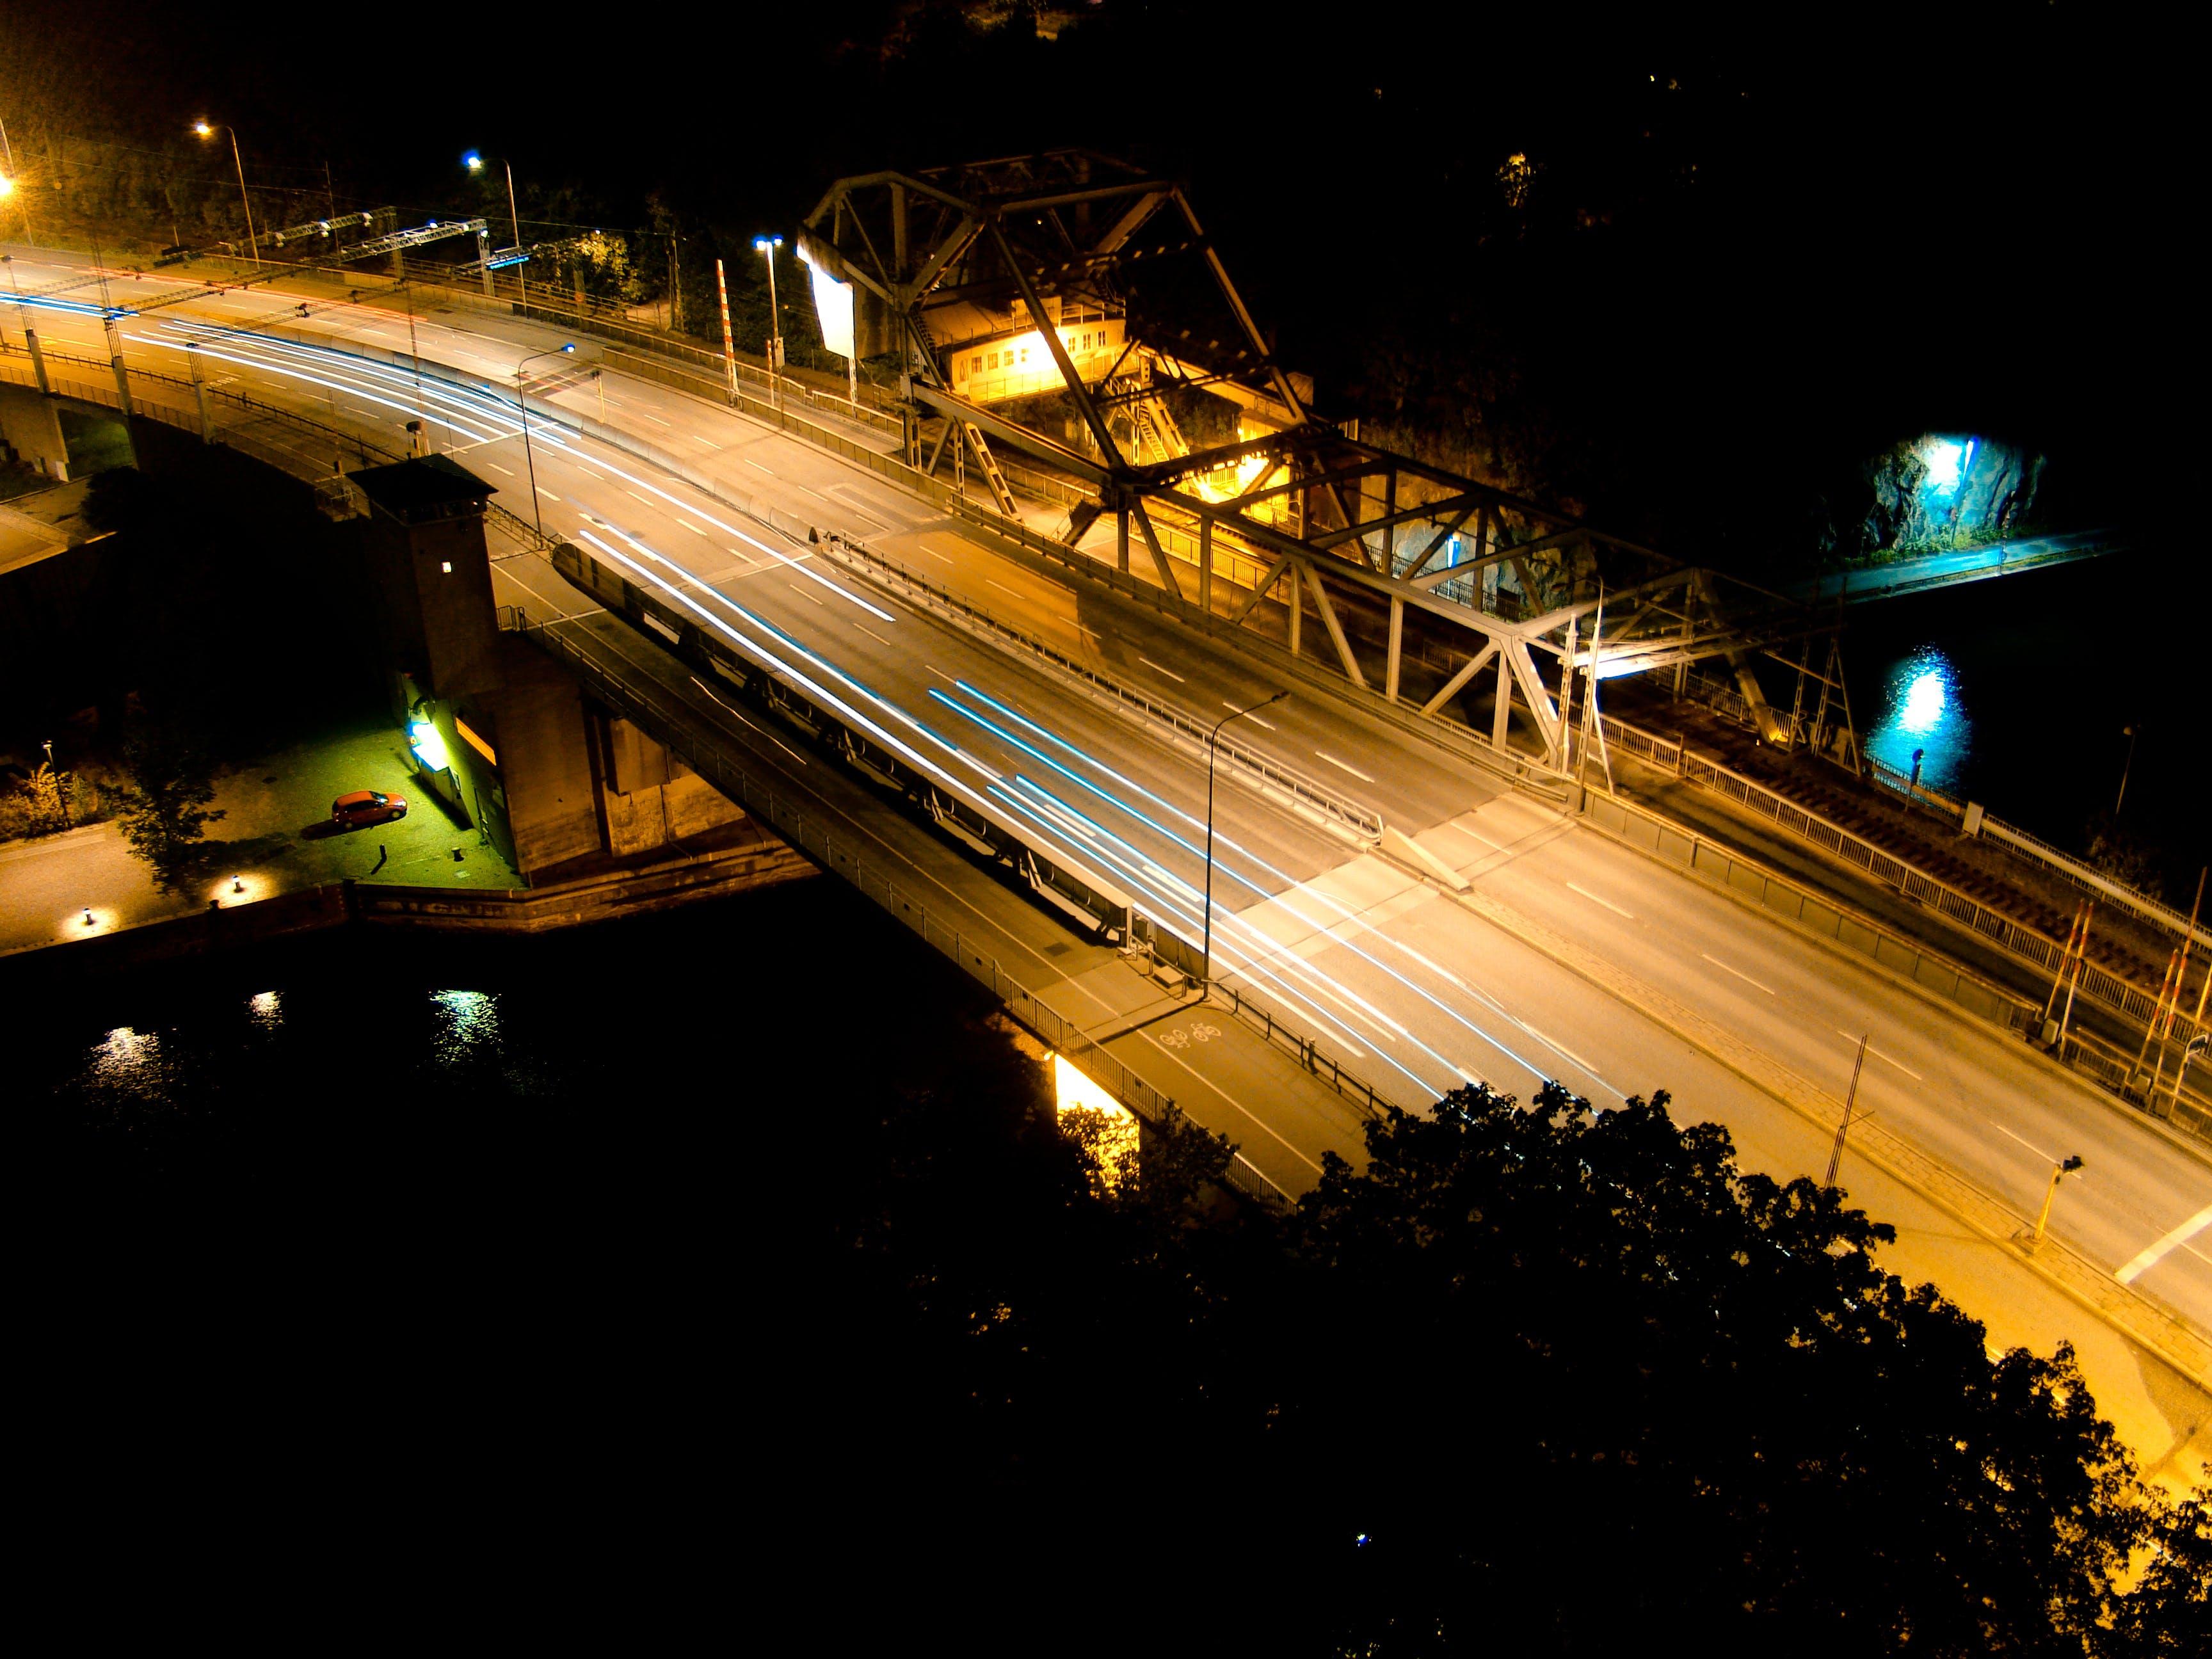 Grey Road during Nighttime